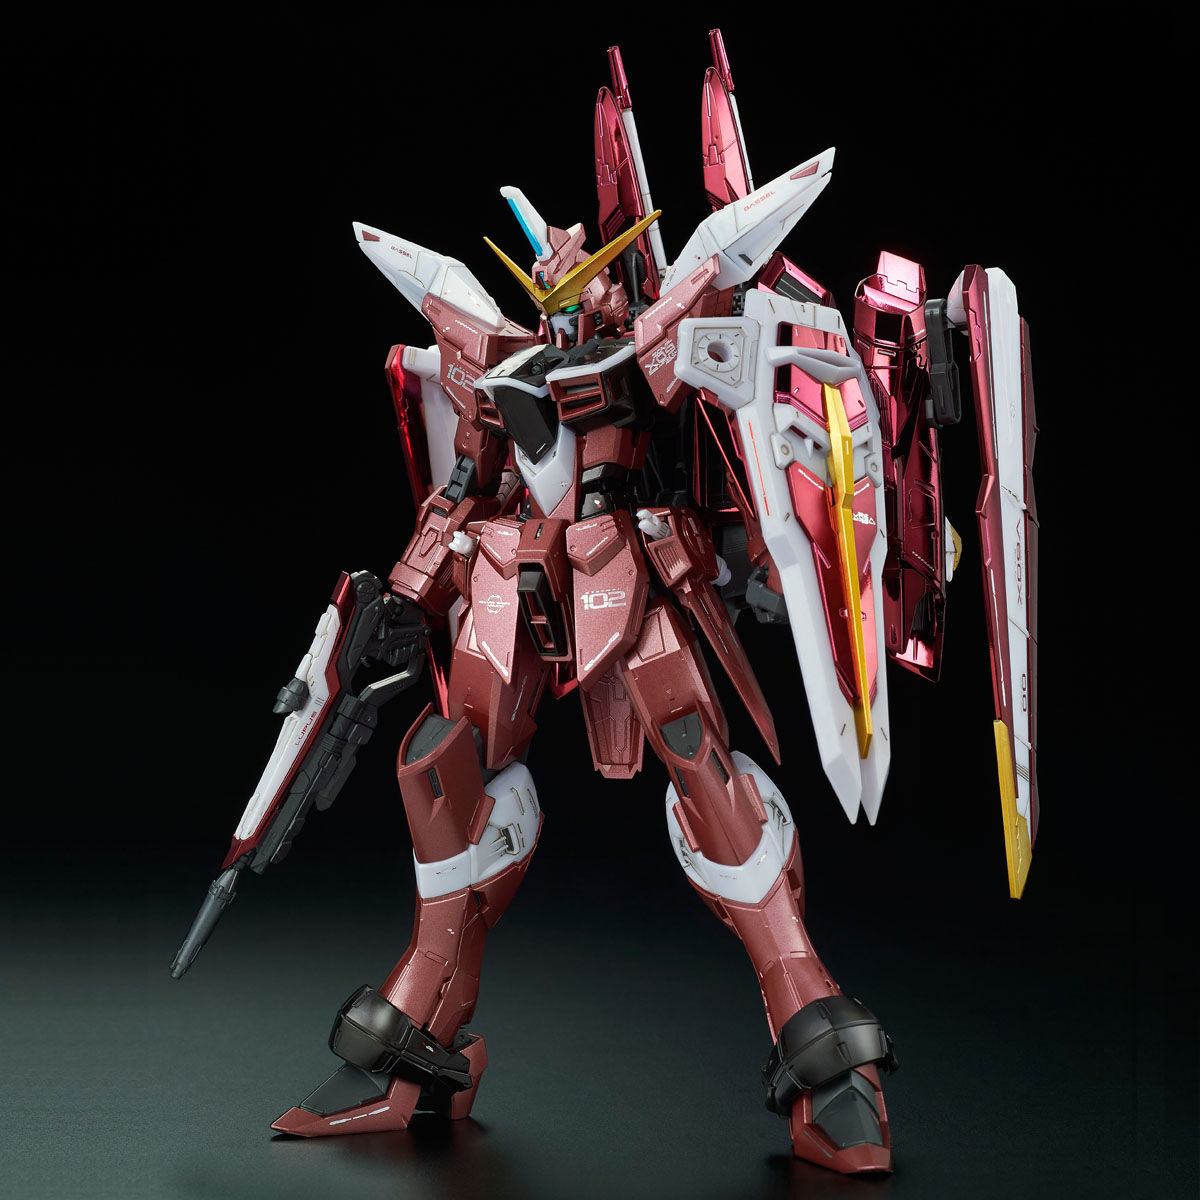 MG 1/100 ZGMF-X09A ジャスティスガンダム[スペシャルコーティング] [Justice Gundam [Clear Color Ver.]]